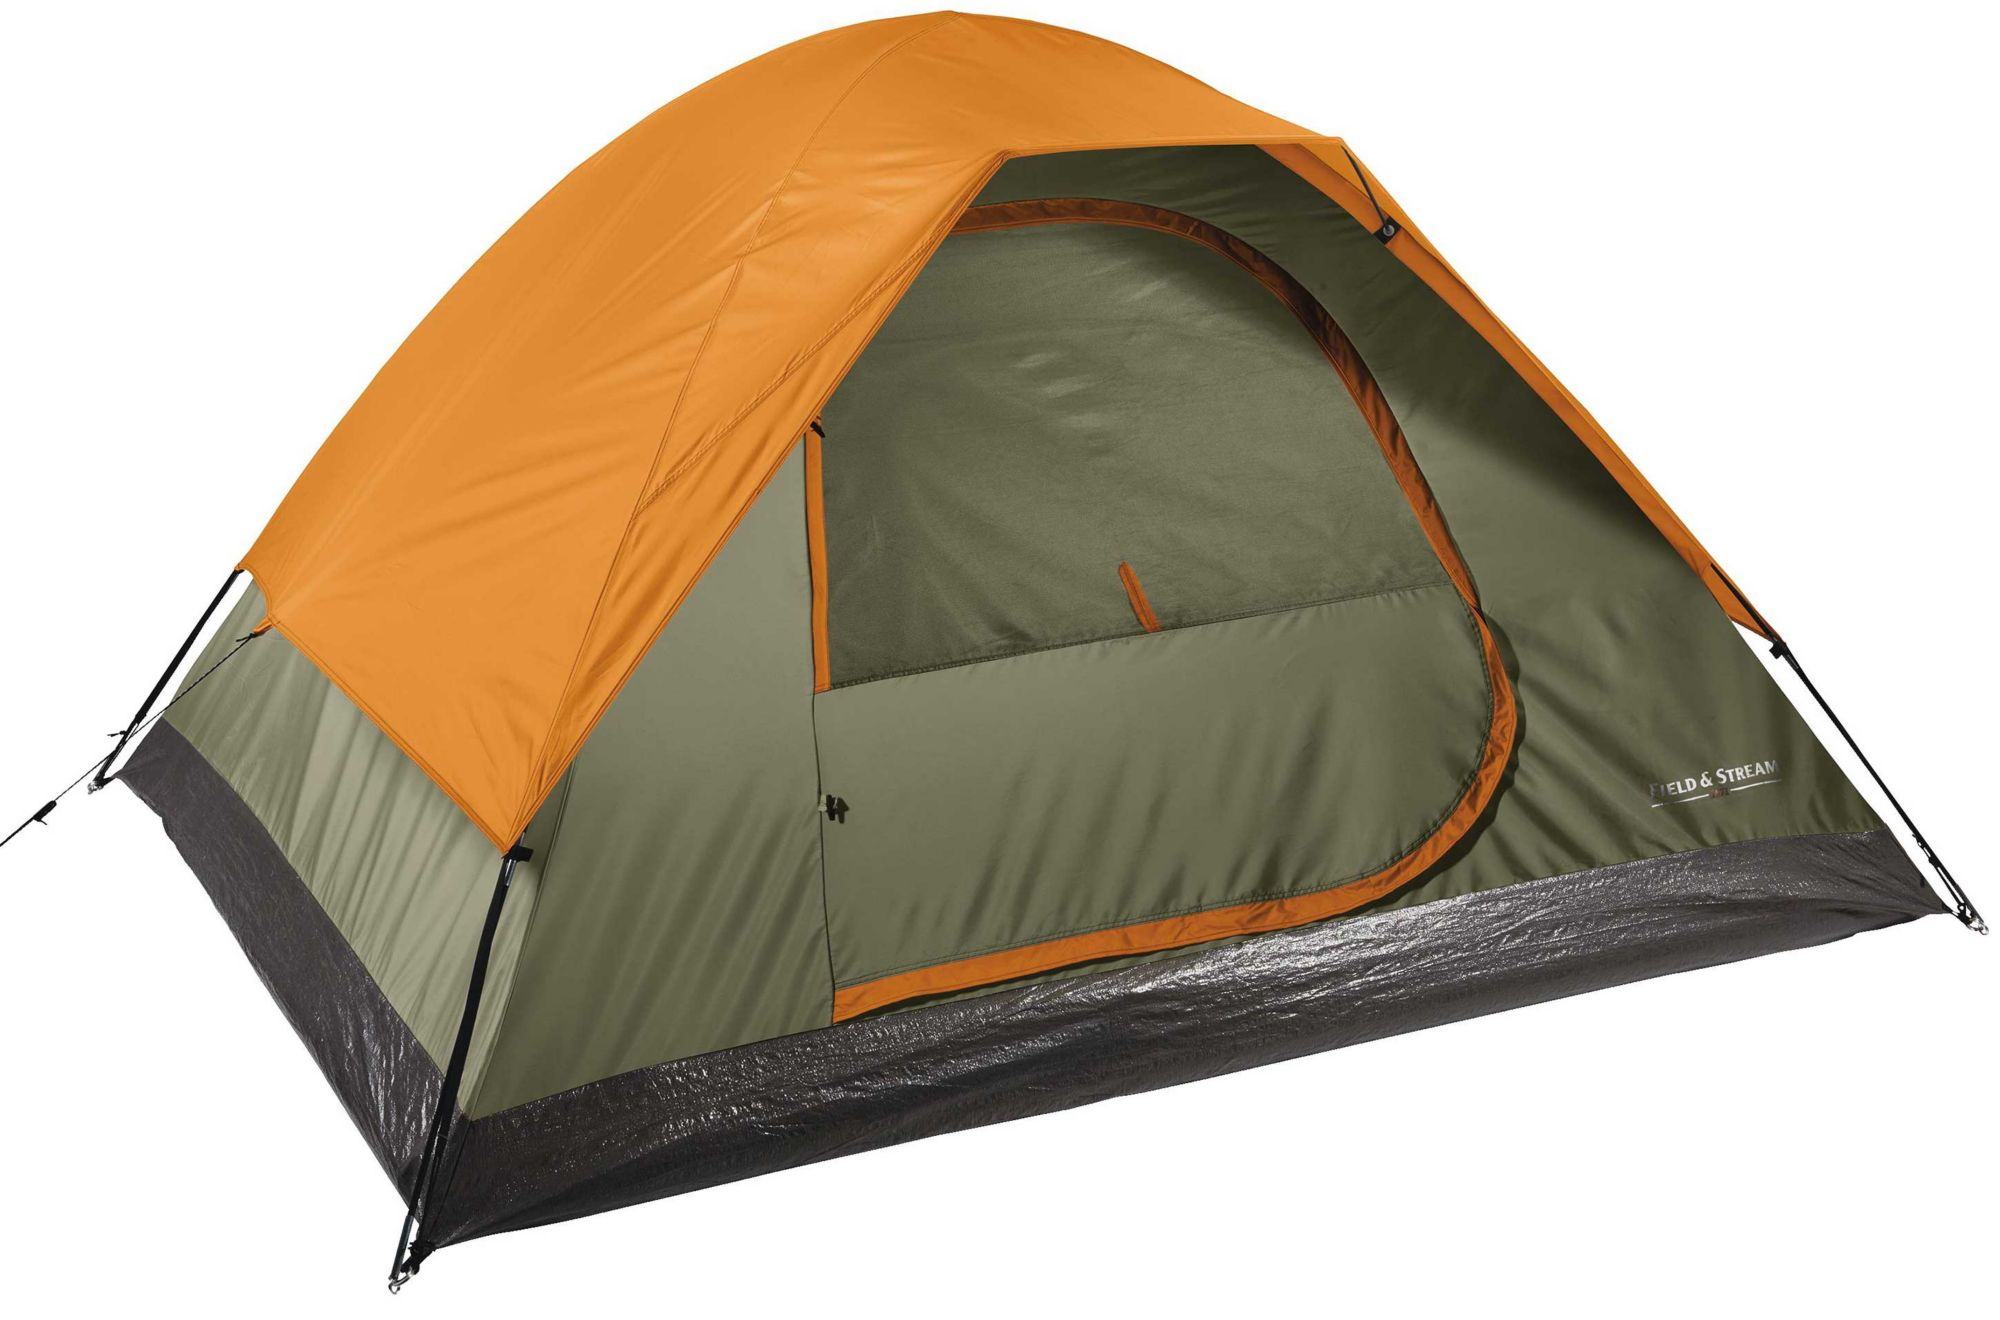 Field u0026 Stream 3 Person Dome Tent  sc 1 st  Field u0026 Stream & Camping Tents - Dome Family u0026 Backyard | Field u0026 Stream